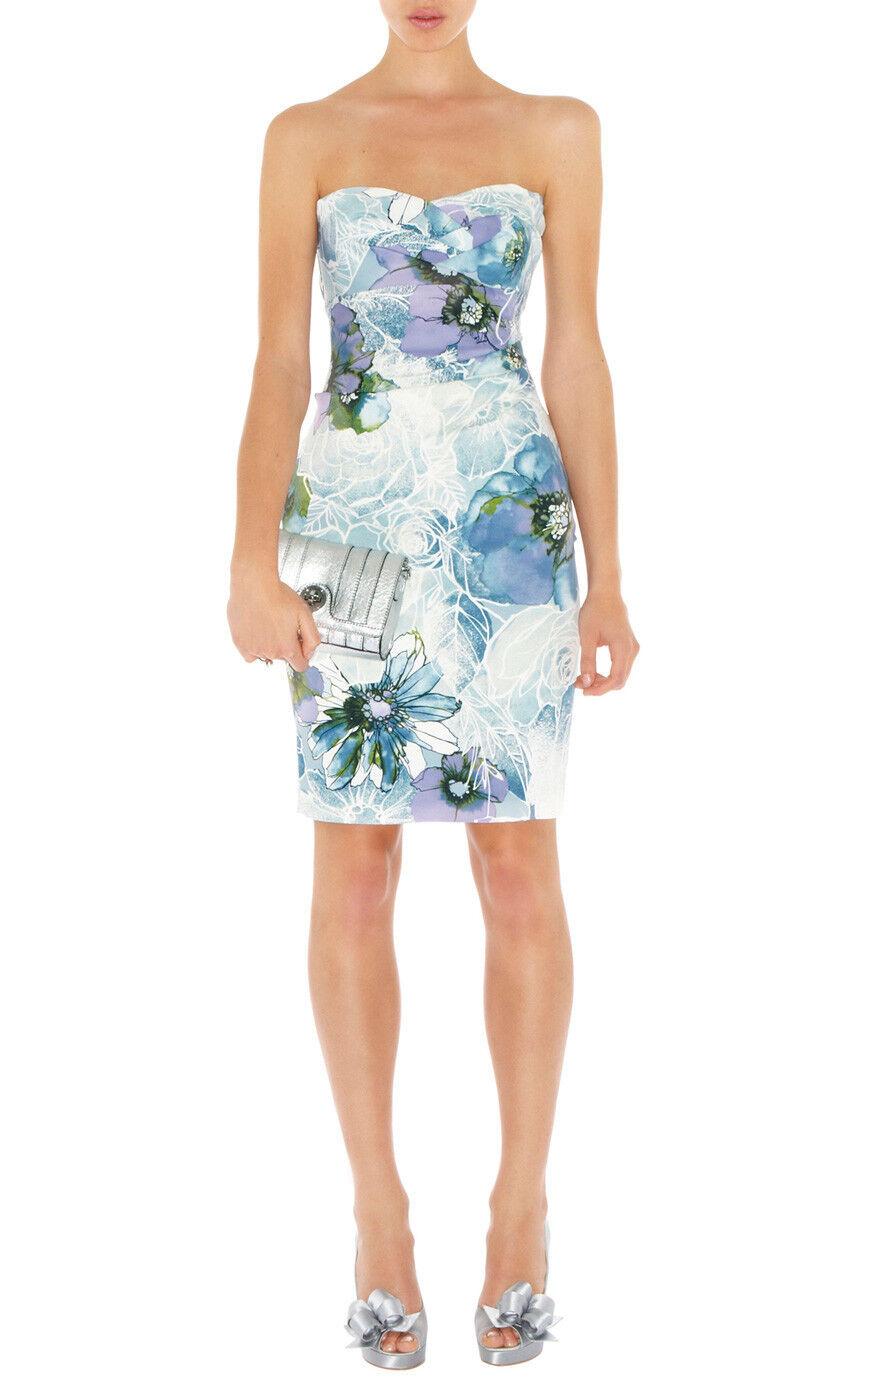 KAREN MILLEN VERY RARE ROMANTIC Blau & CREAM FLORAL PRINT CORSET DRESS 12 BNWT